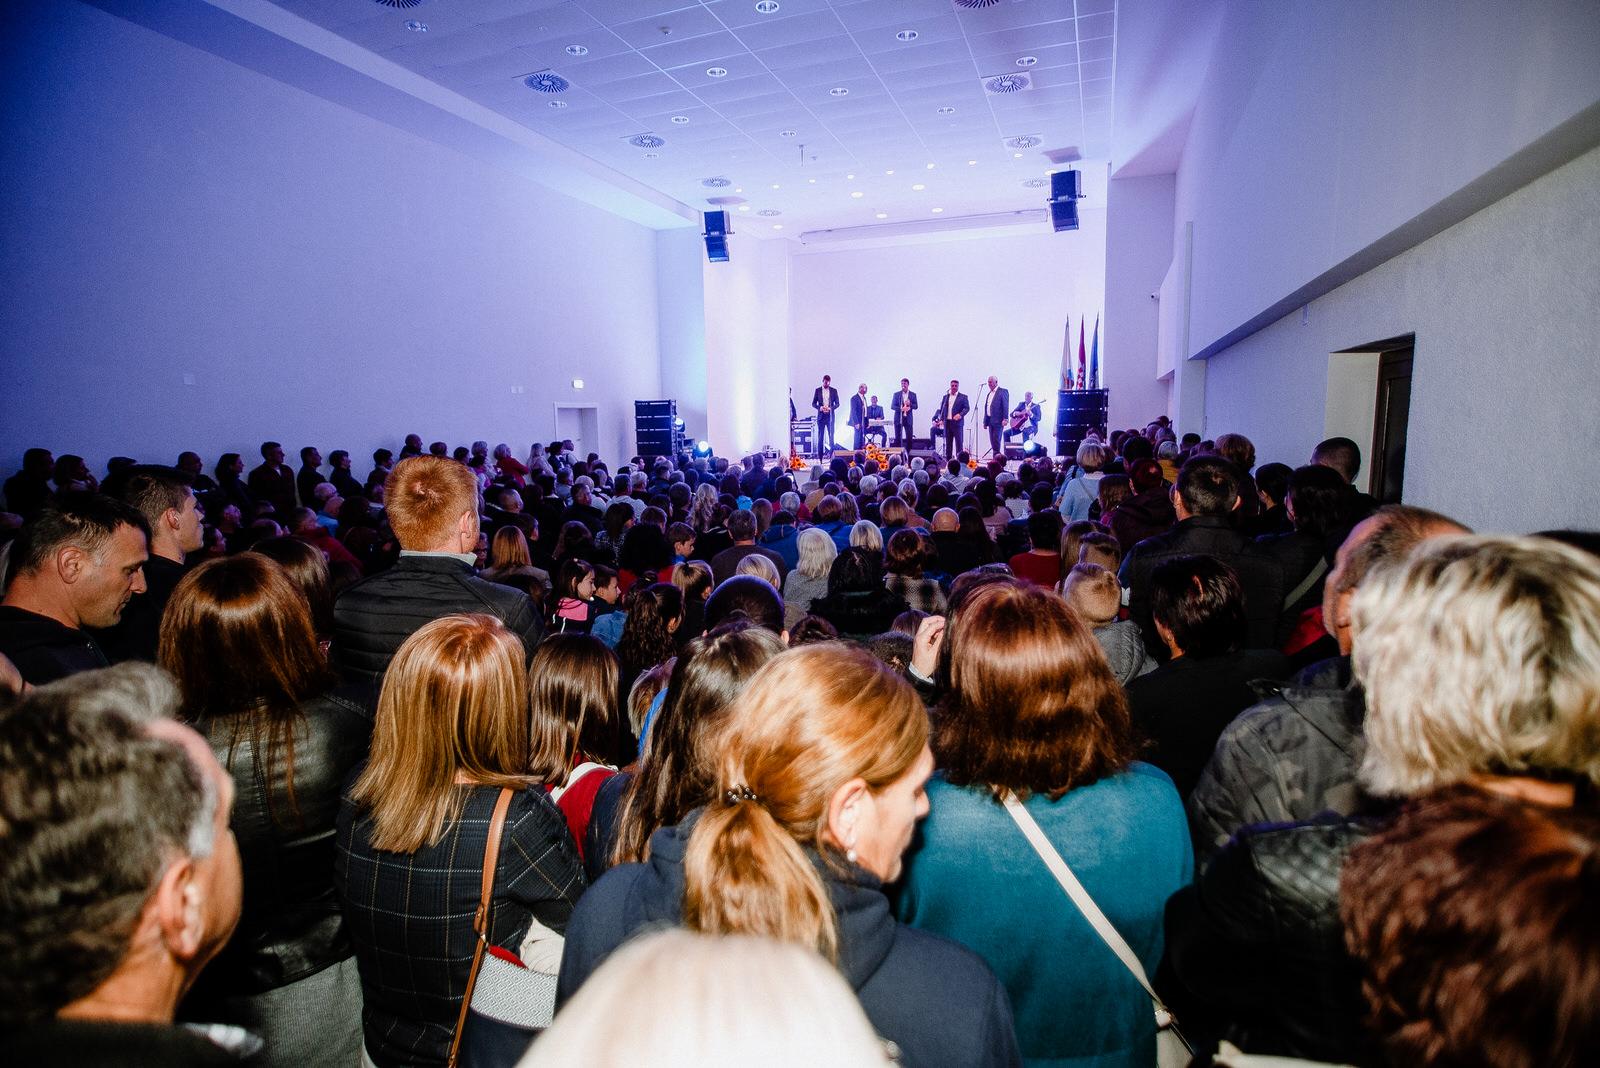 likaclub_korenica_klapa-intrade_dan-neovisnosti_2019-20